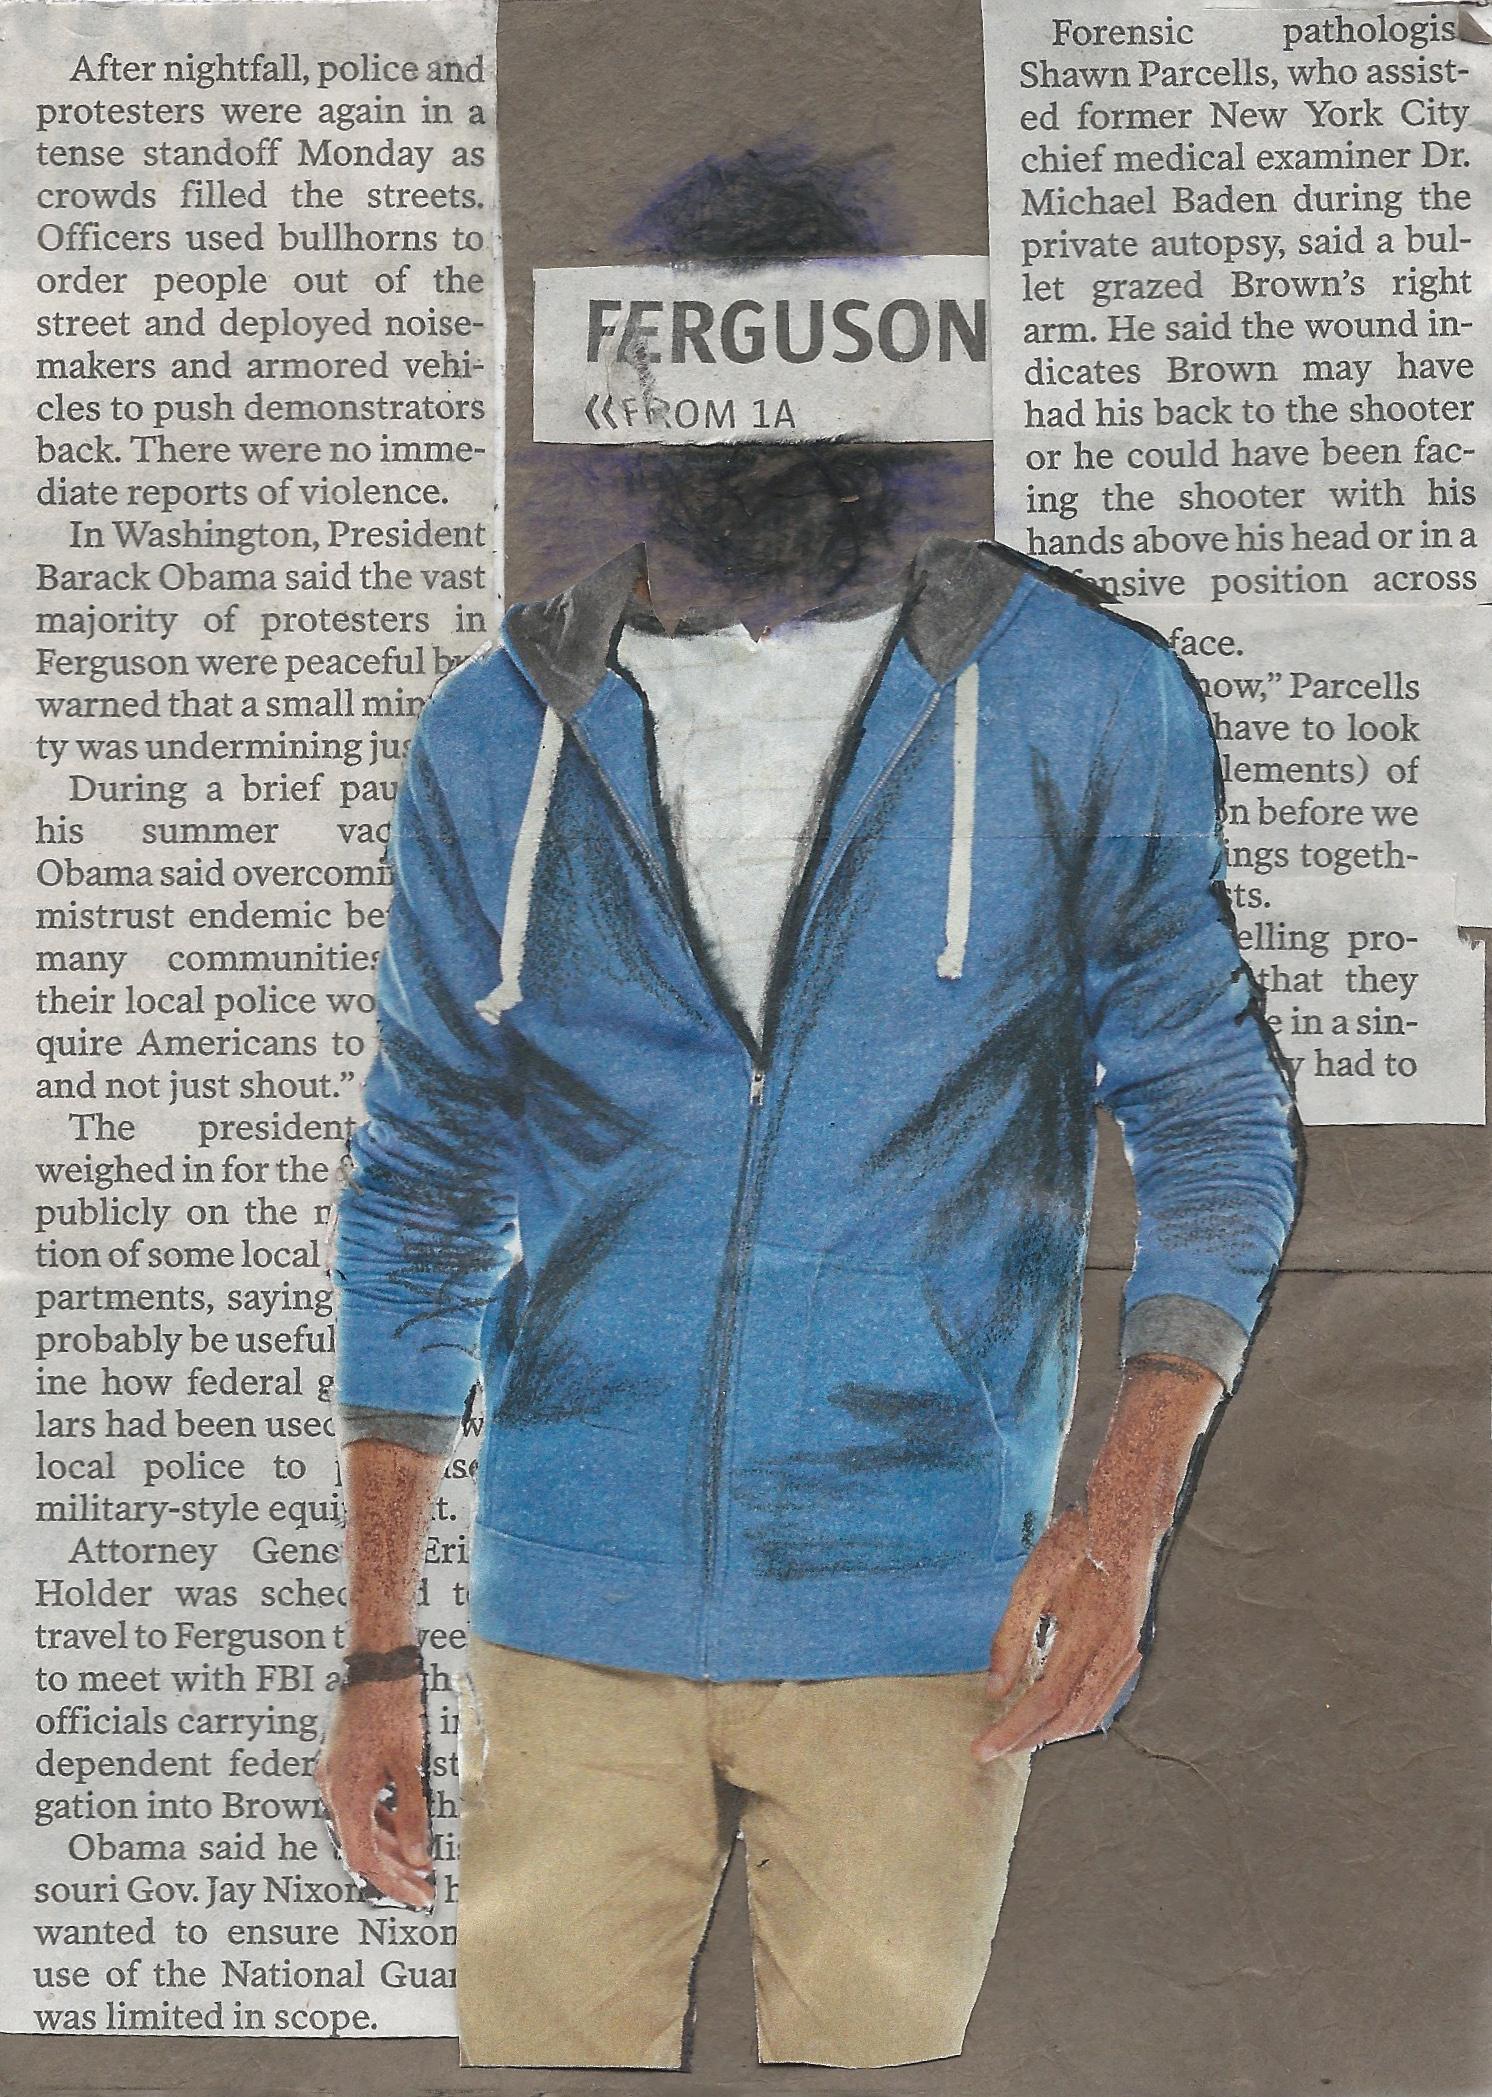 Ferguson 3 of 4  // 5x7in // Media: kraft paper, newsprint, & graphite